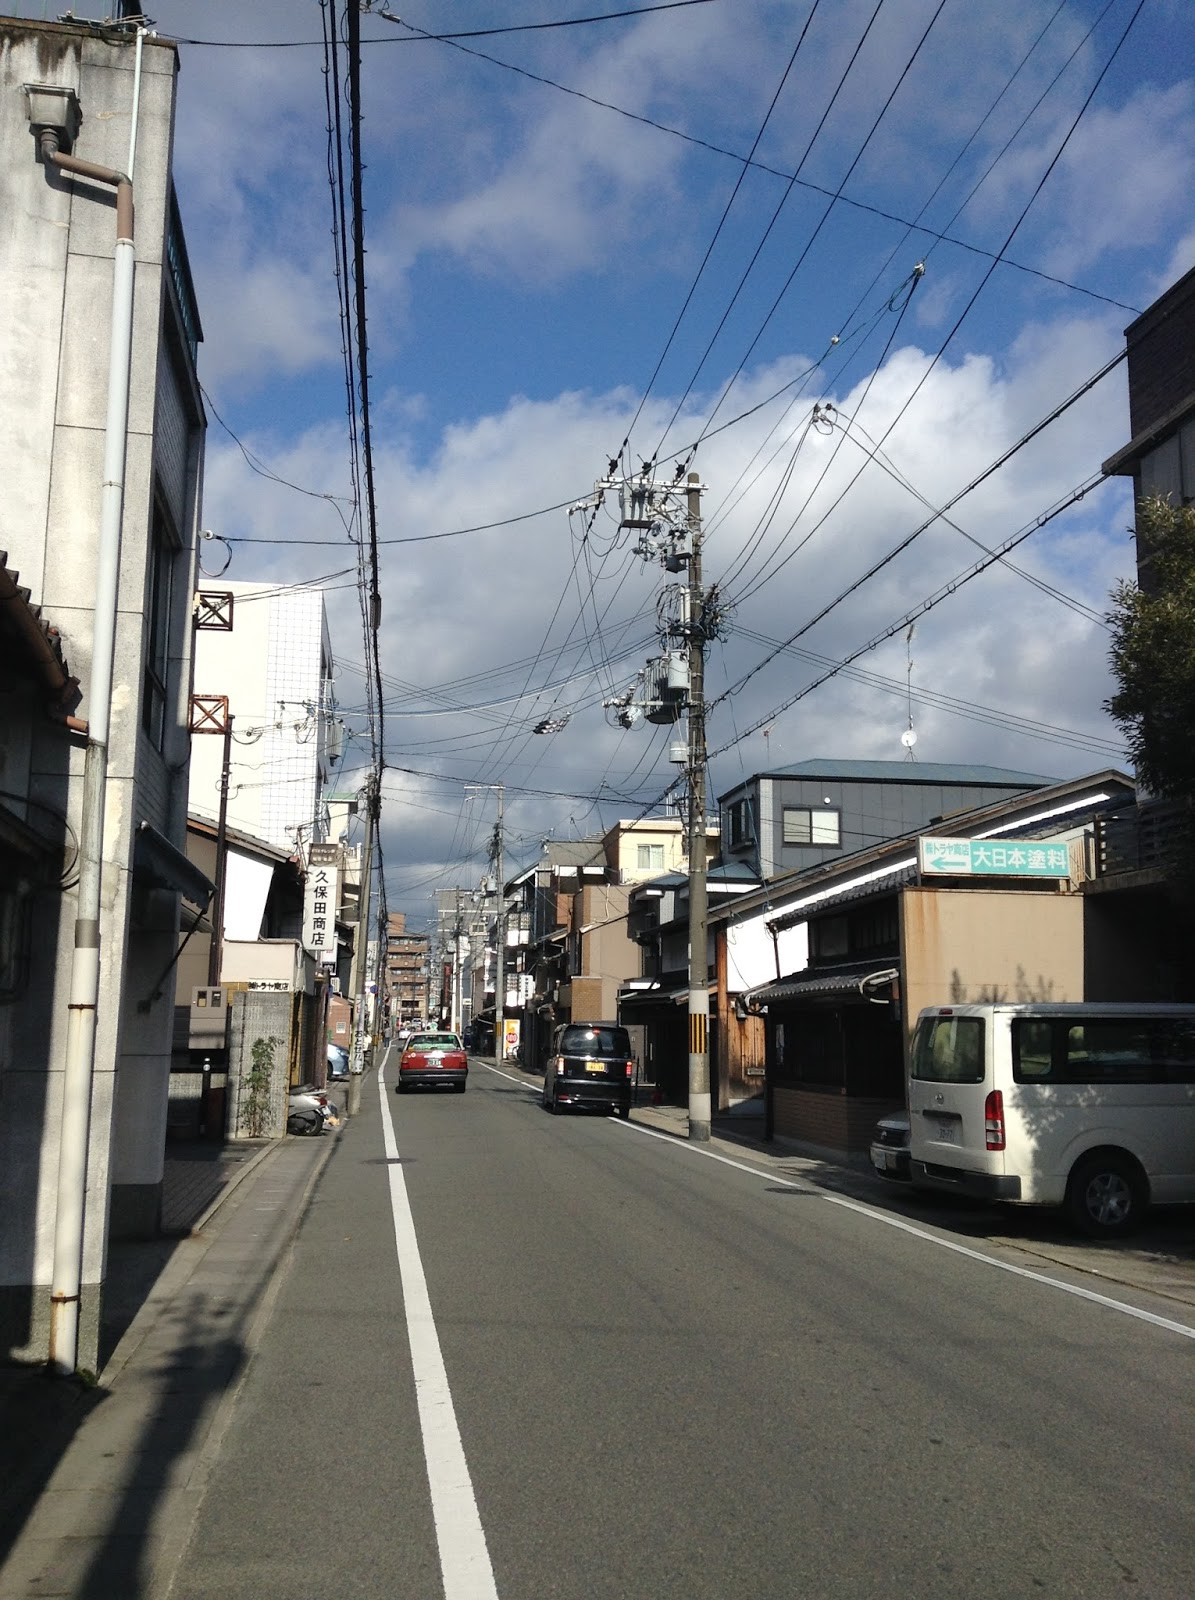 Japanese street, Kyoto suburbs